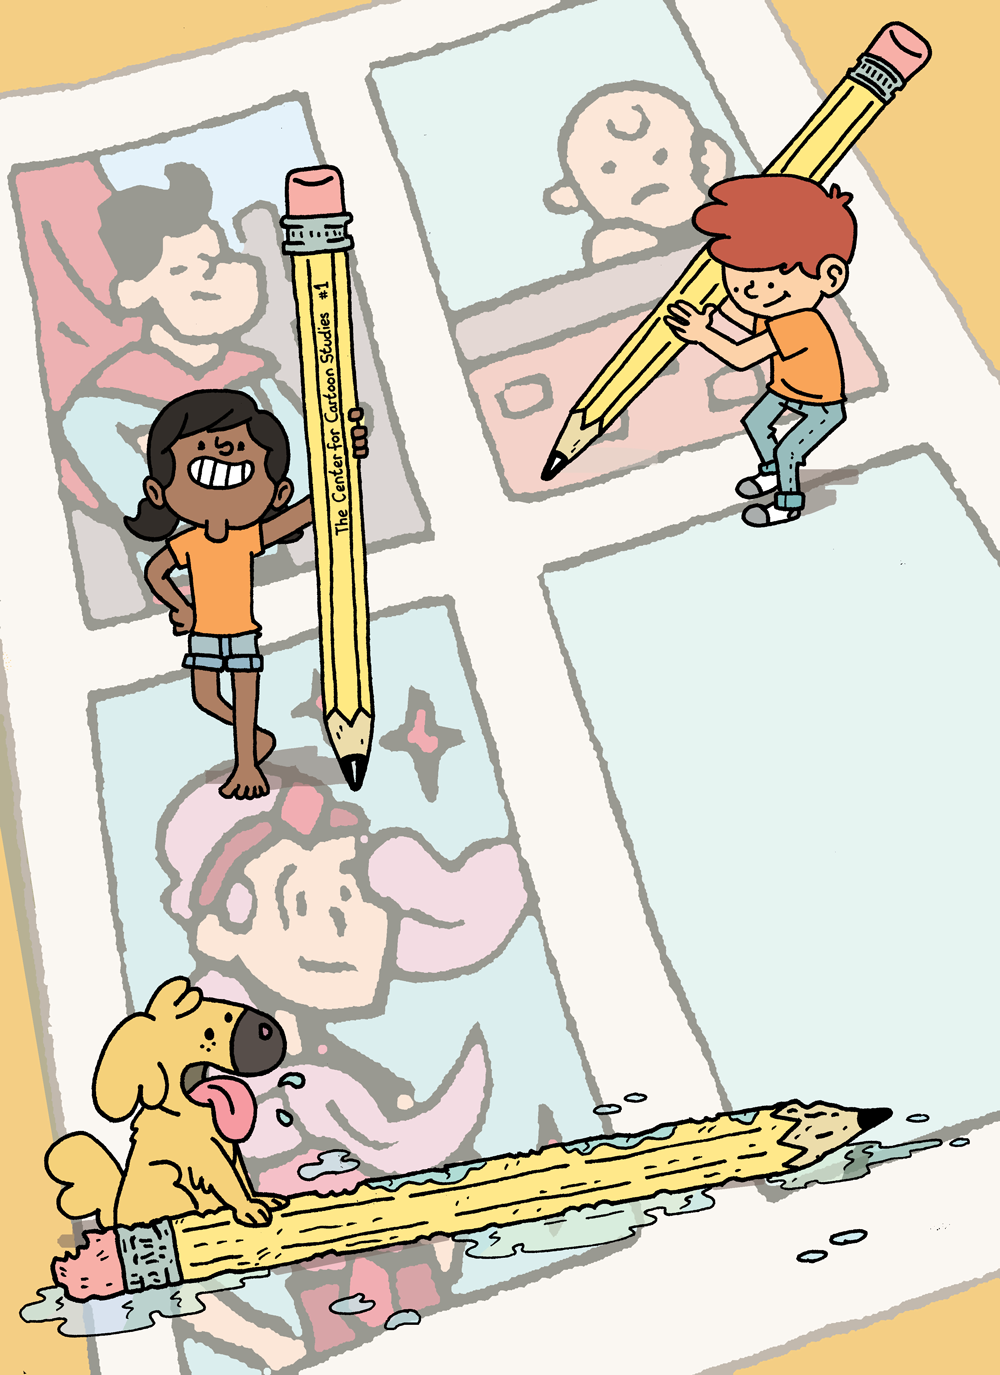 Poster, The Center for Cartoon Studies Kids Cartoon Club